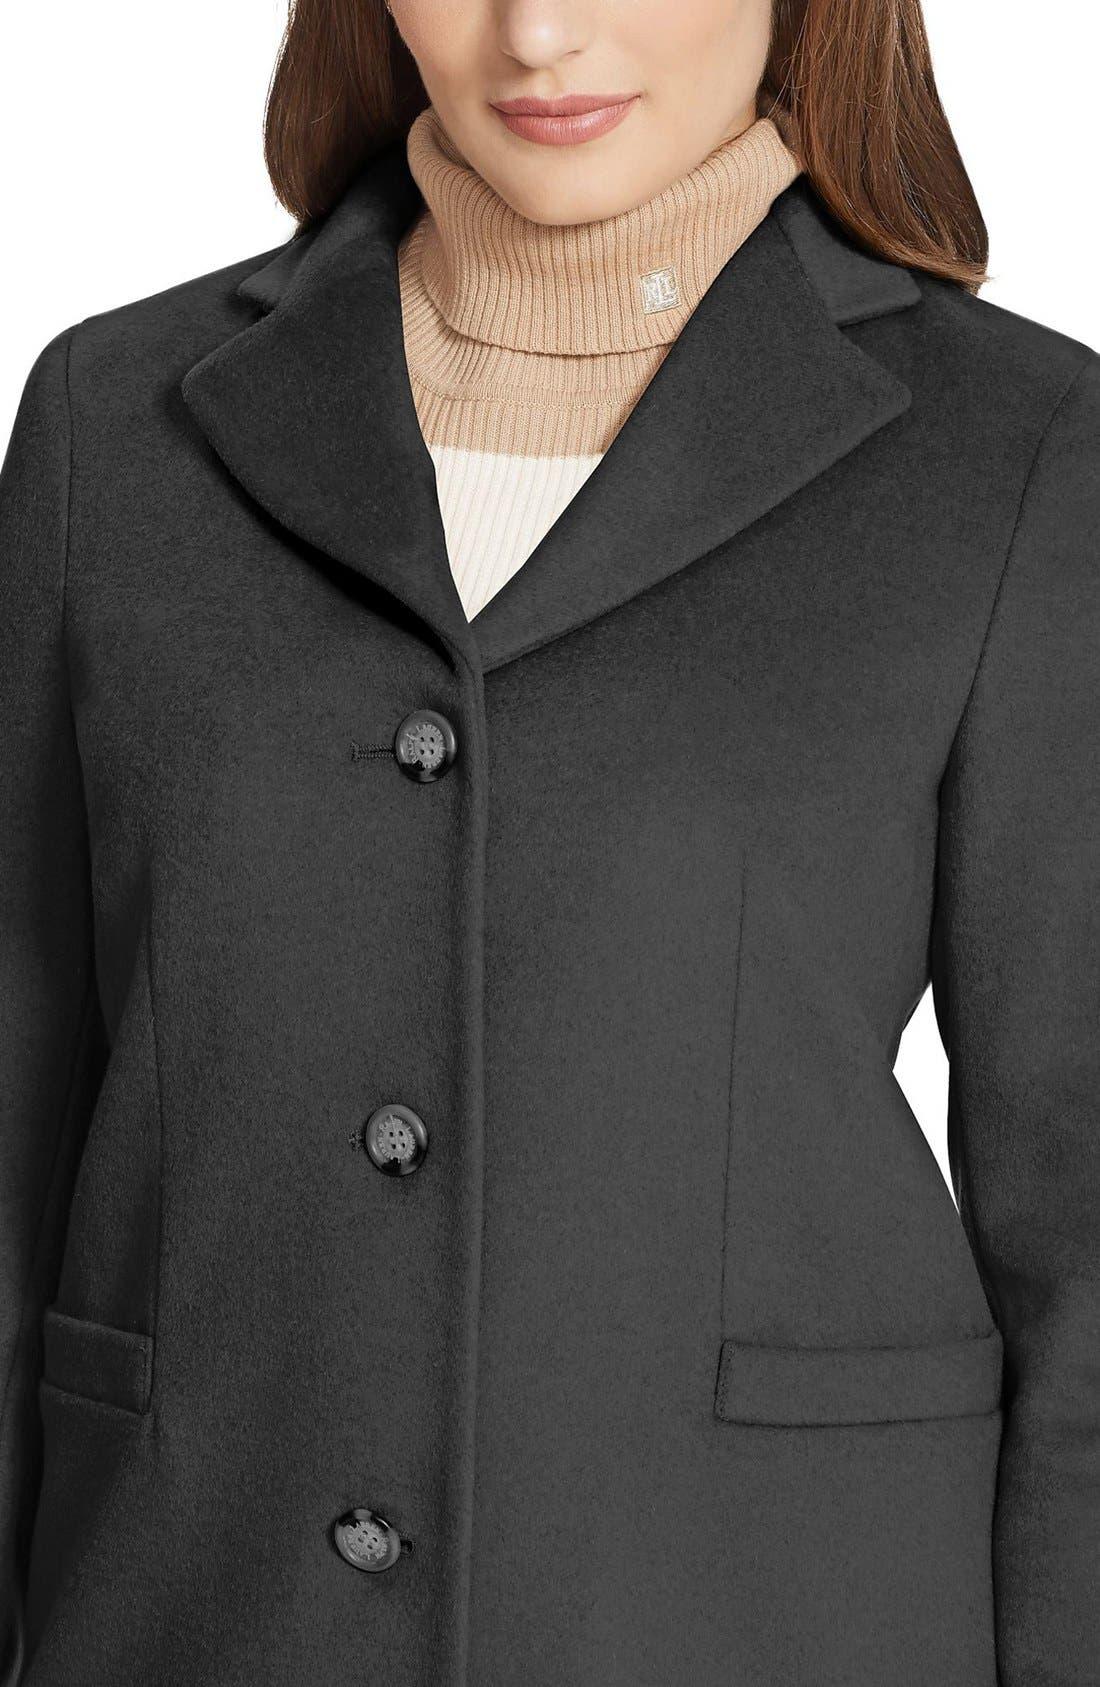 LAUREN RALPH LAUREN,                             Wool Blend Reefer Coat,                             Alternate thumbnail 3, color,                             BLACK